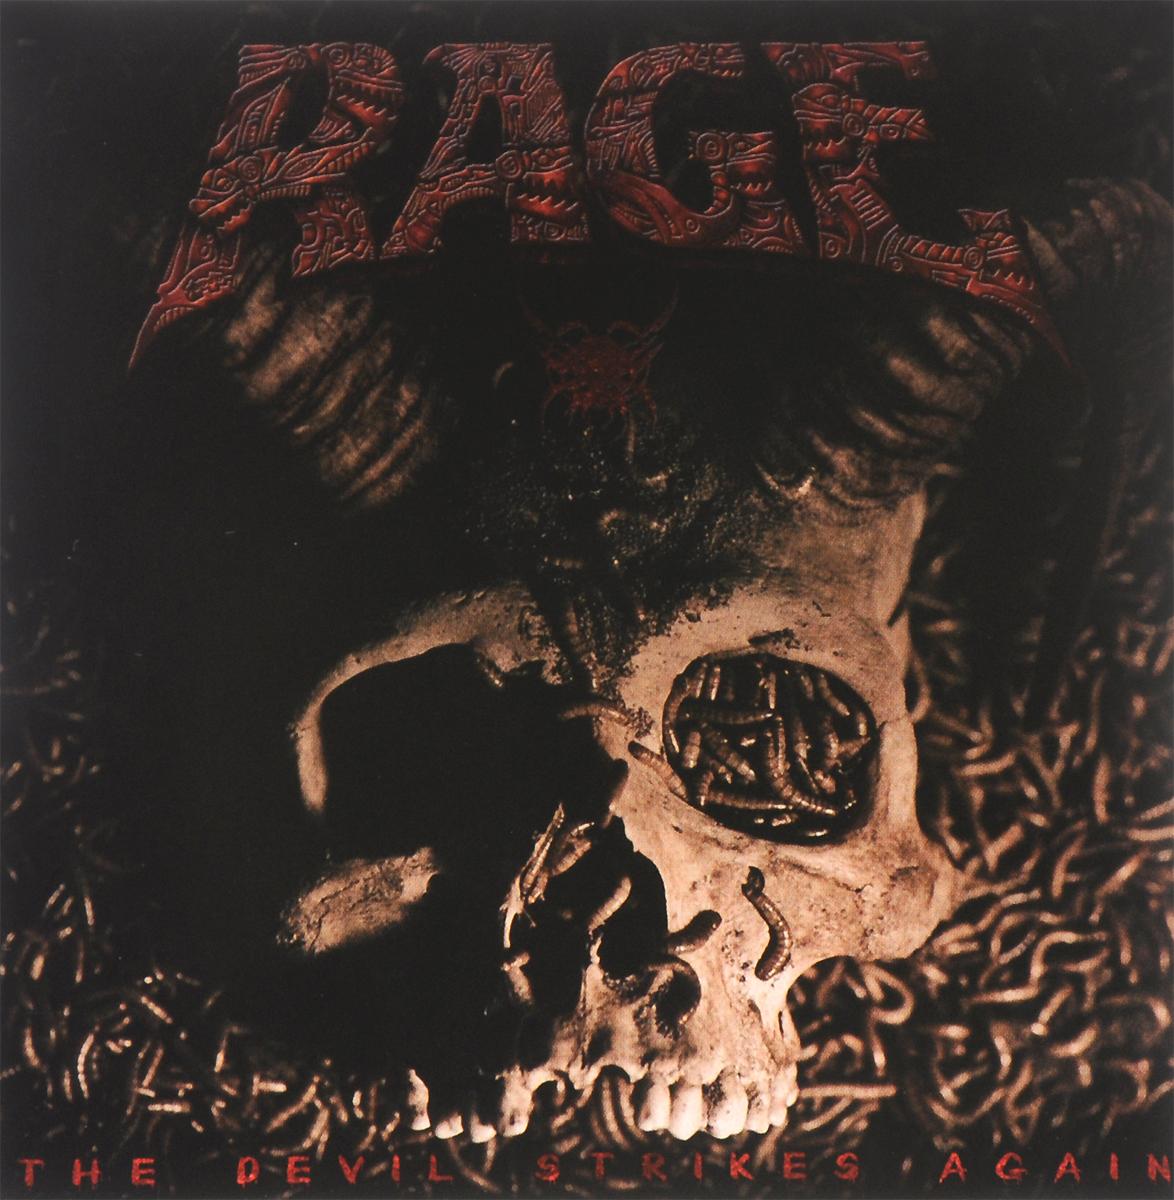 Rage Rage. The Devil Strikes Again rage rage seasons of the black 2 lp